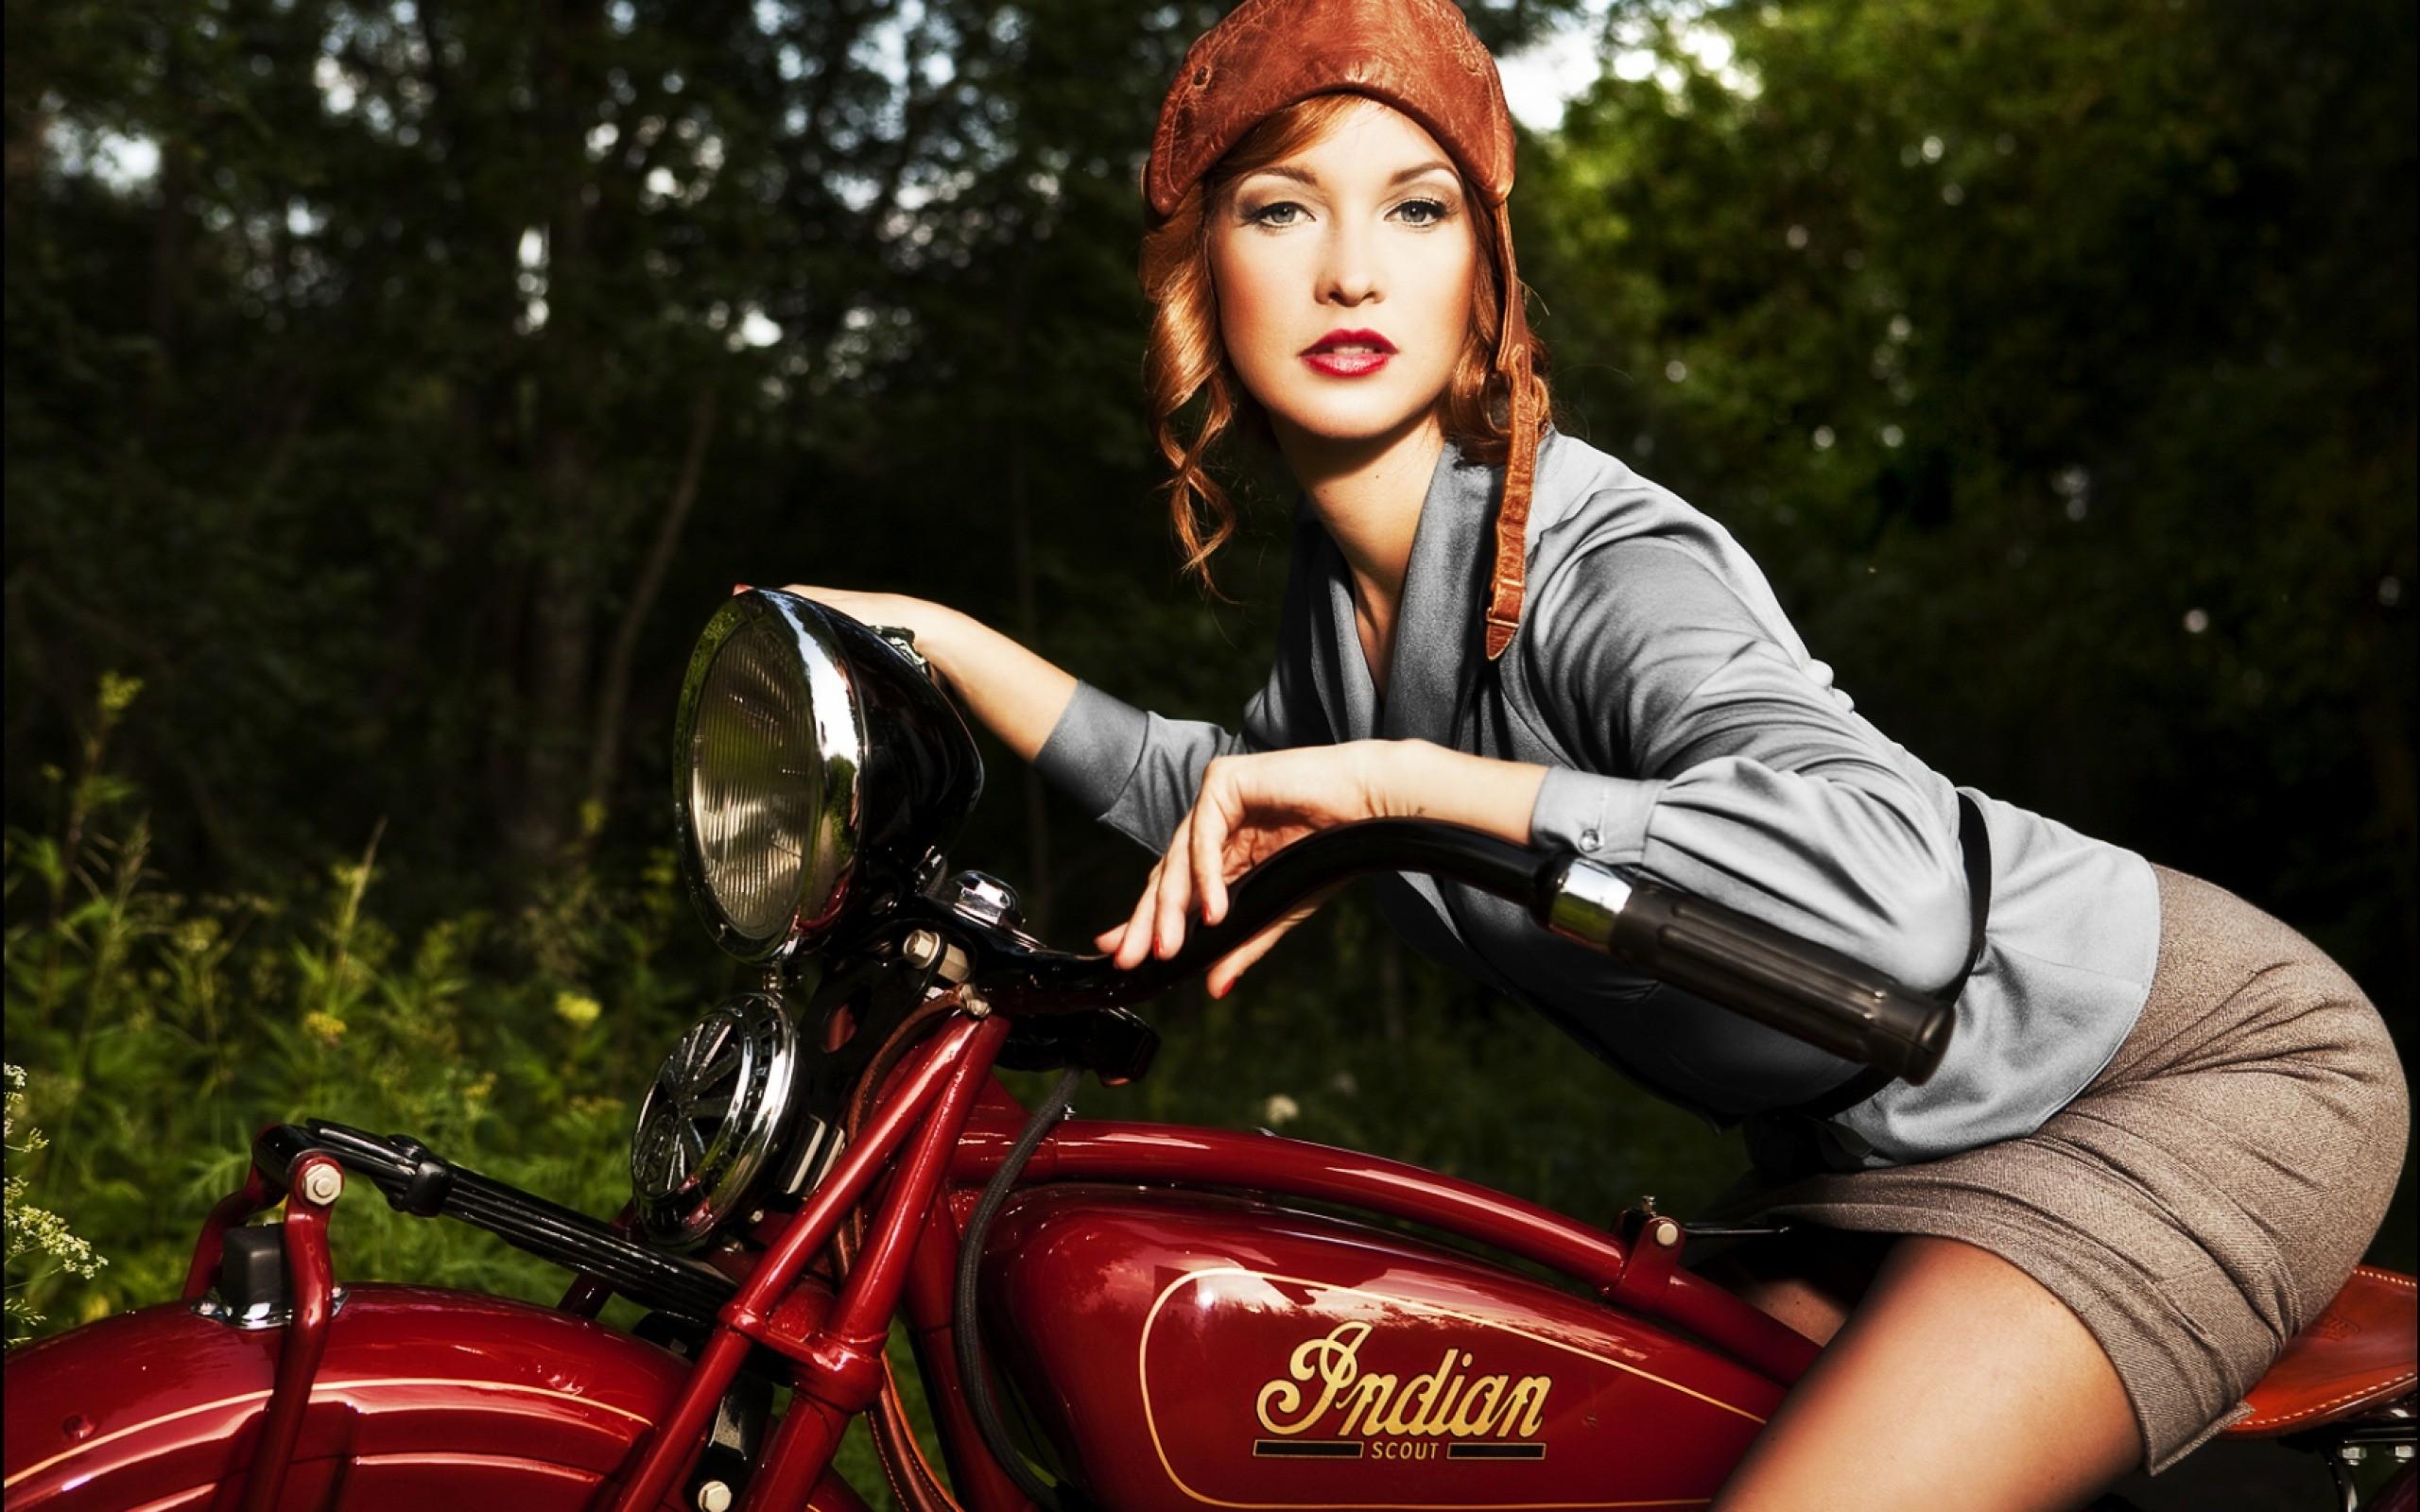 Motorcycle Women Wallpaper - WallpaperSafari